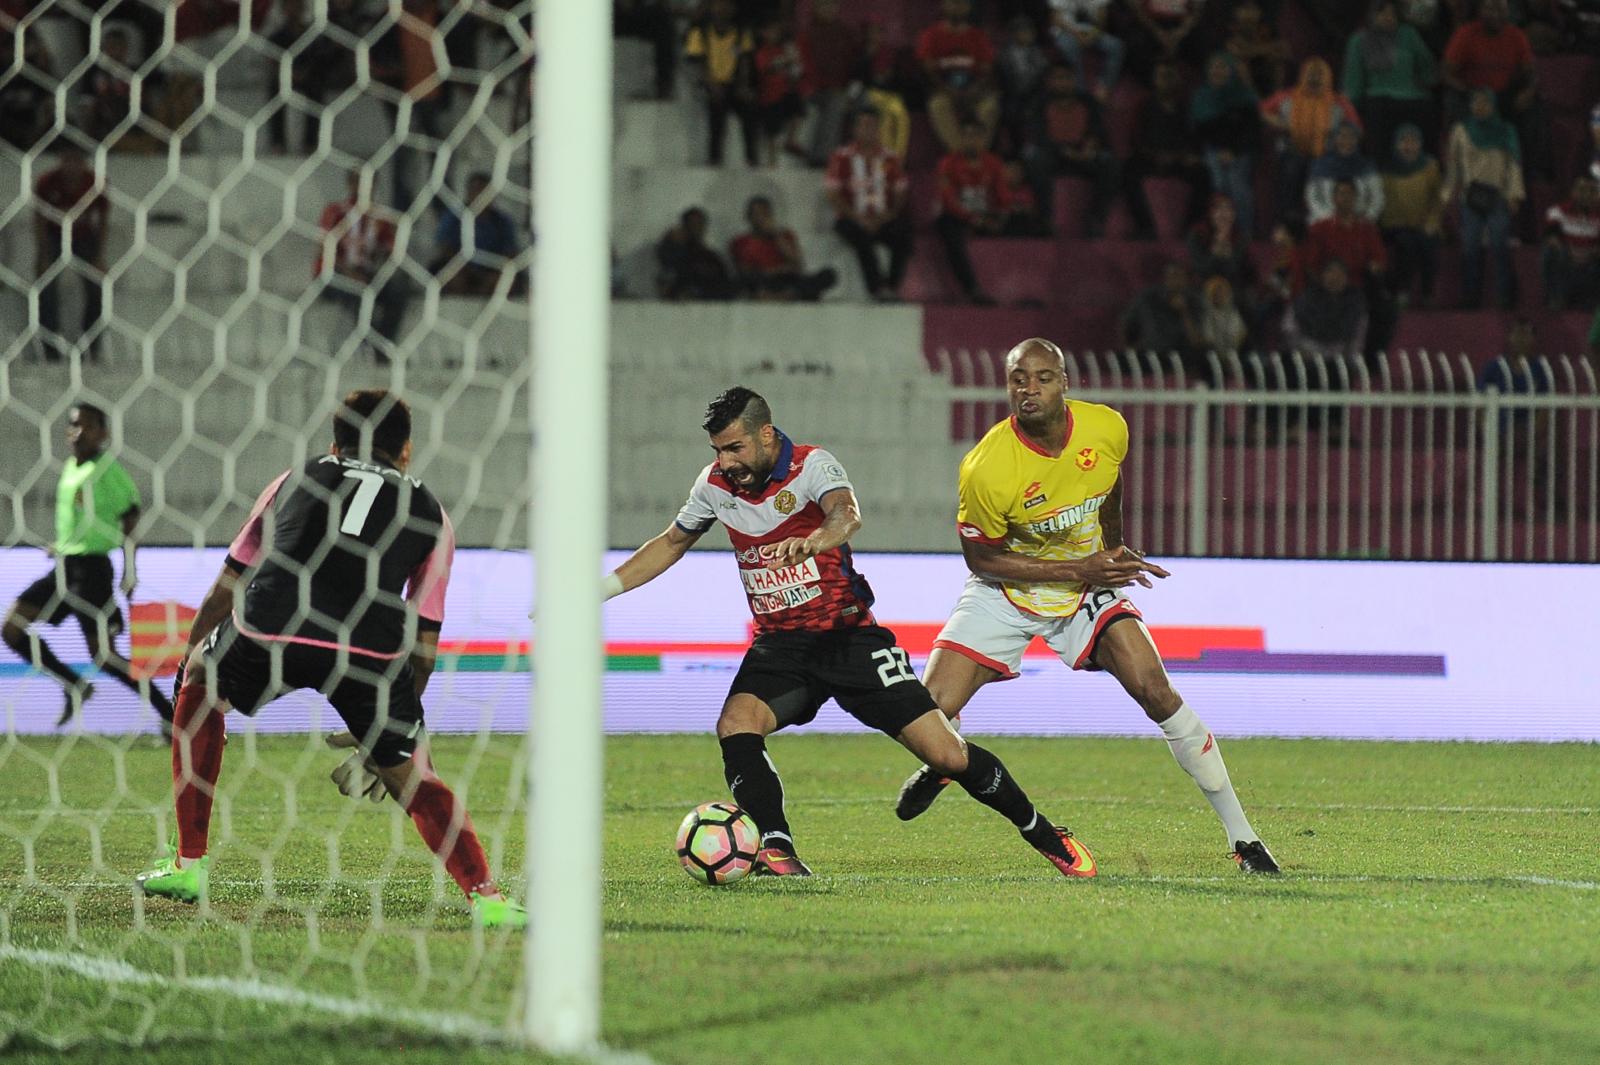 Kelantan's Mohammed Ghaddar (left) tries to elude Selangor's Ugo Ukah 25/2/2017